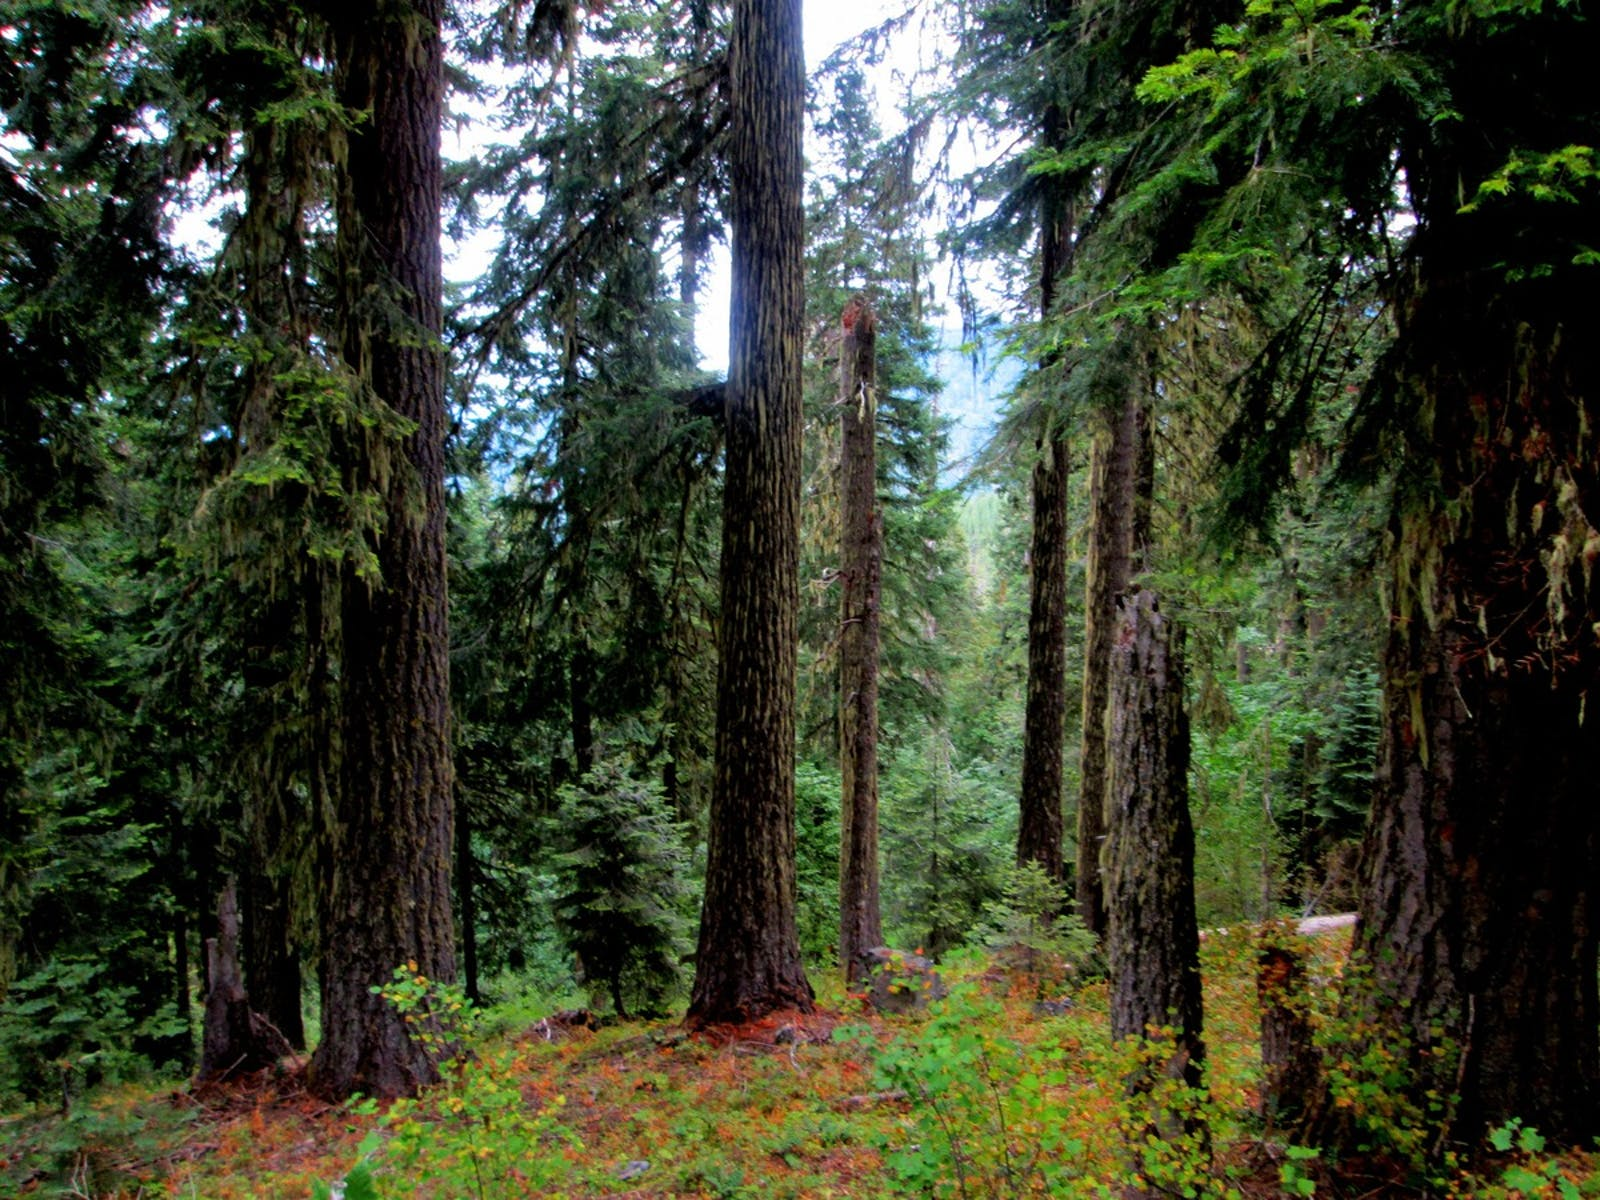 Klamath-Siskiyou Forests